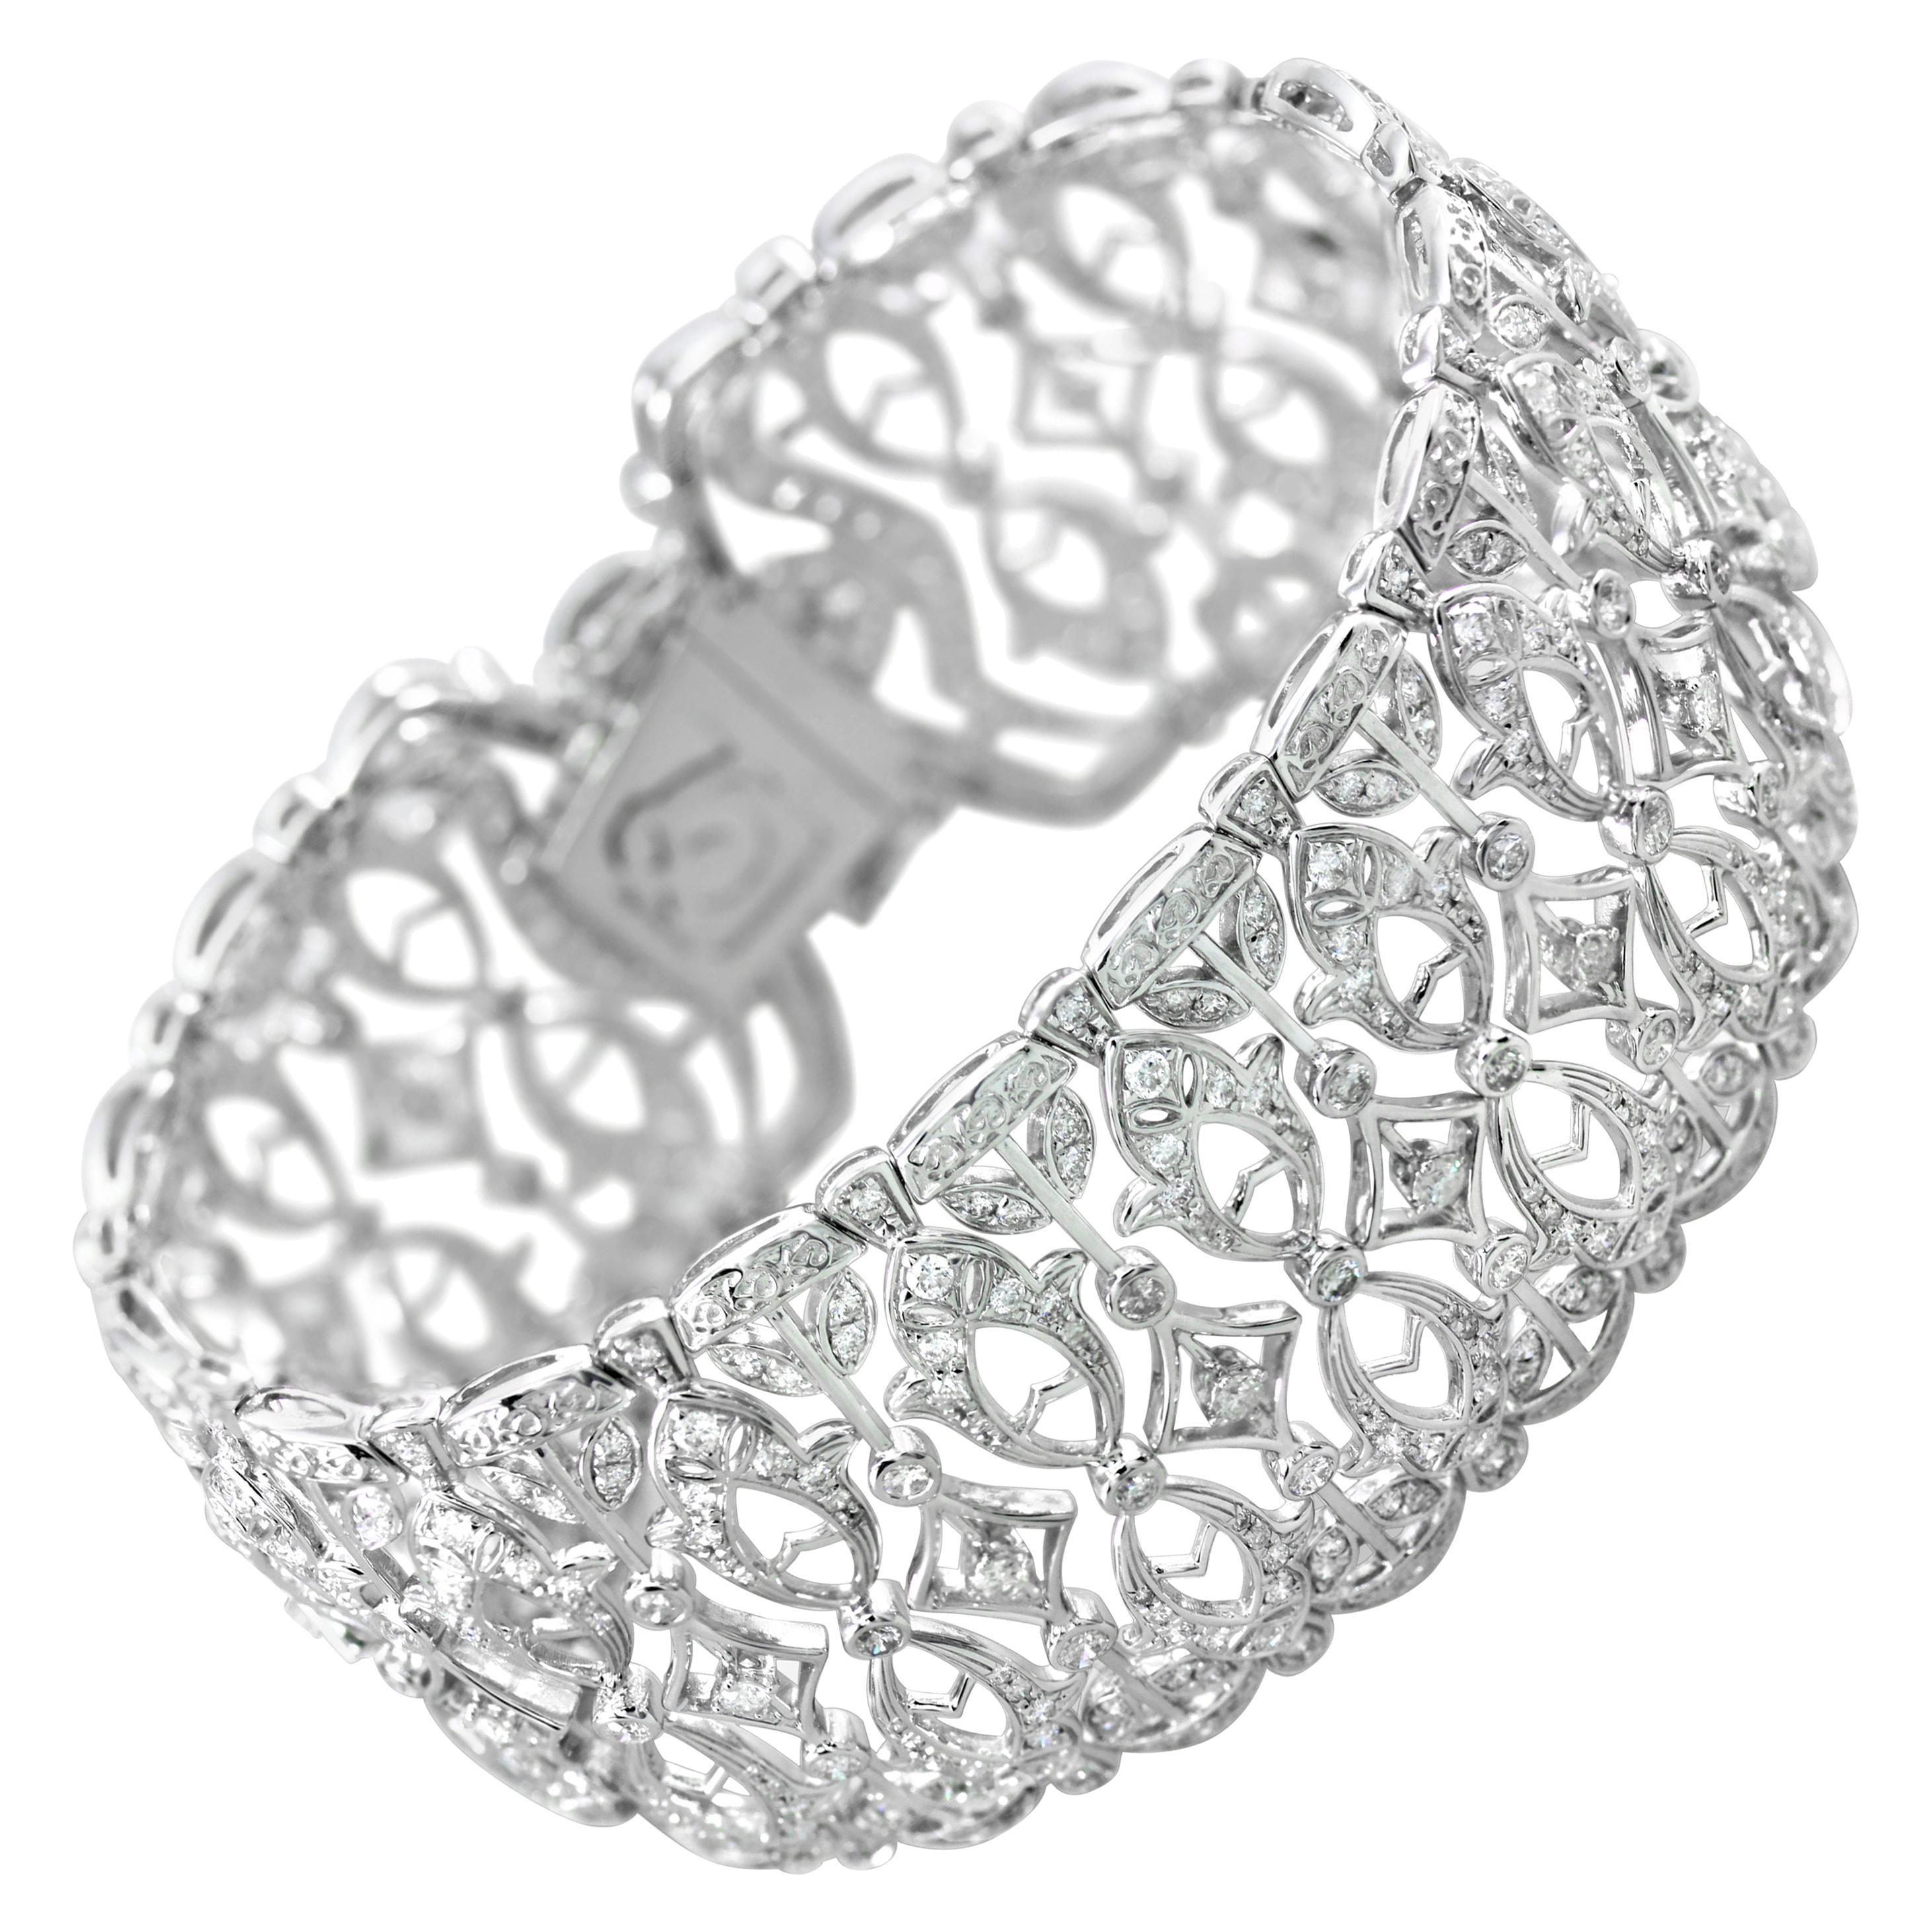 Lace Inspired Diamond Bangle Bracelet in 18 Karat White Gold